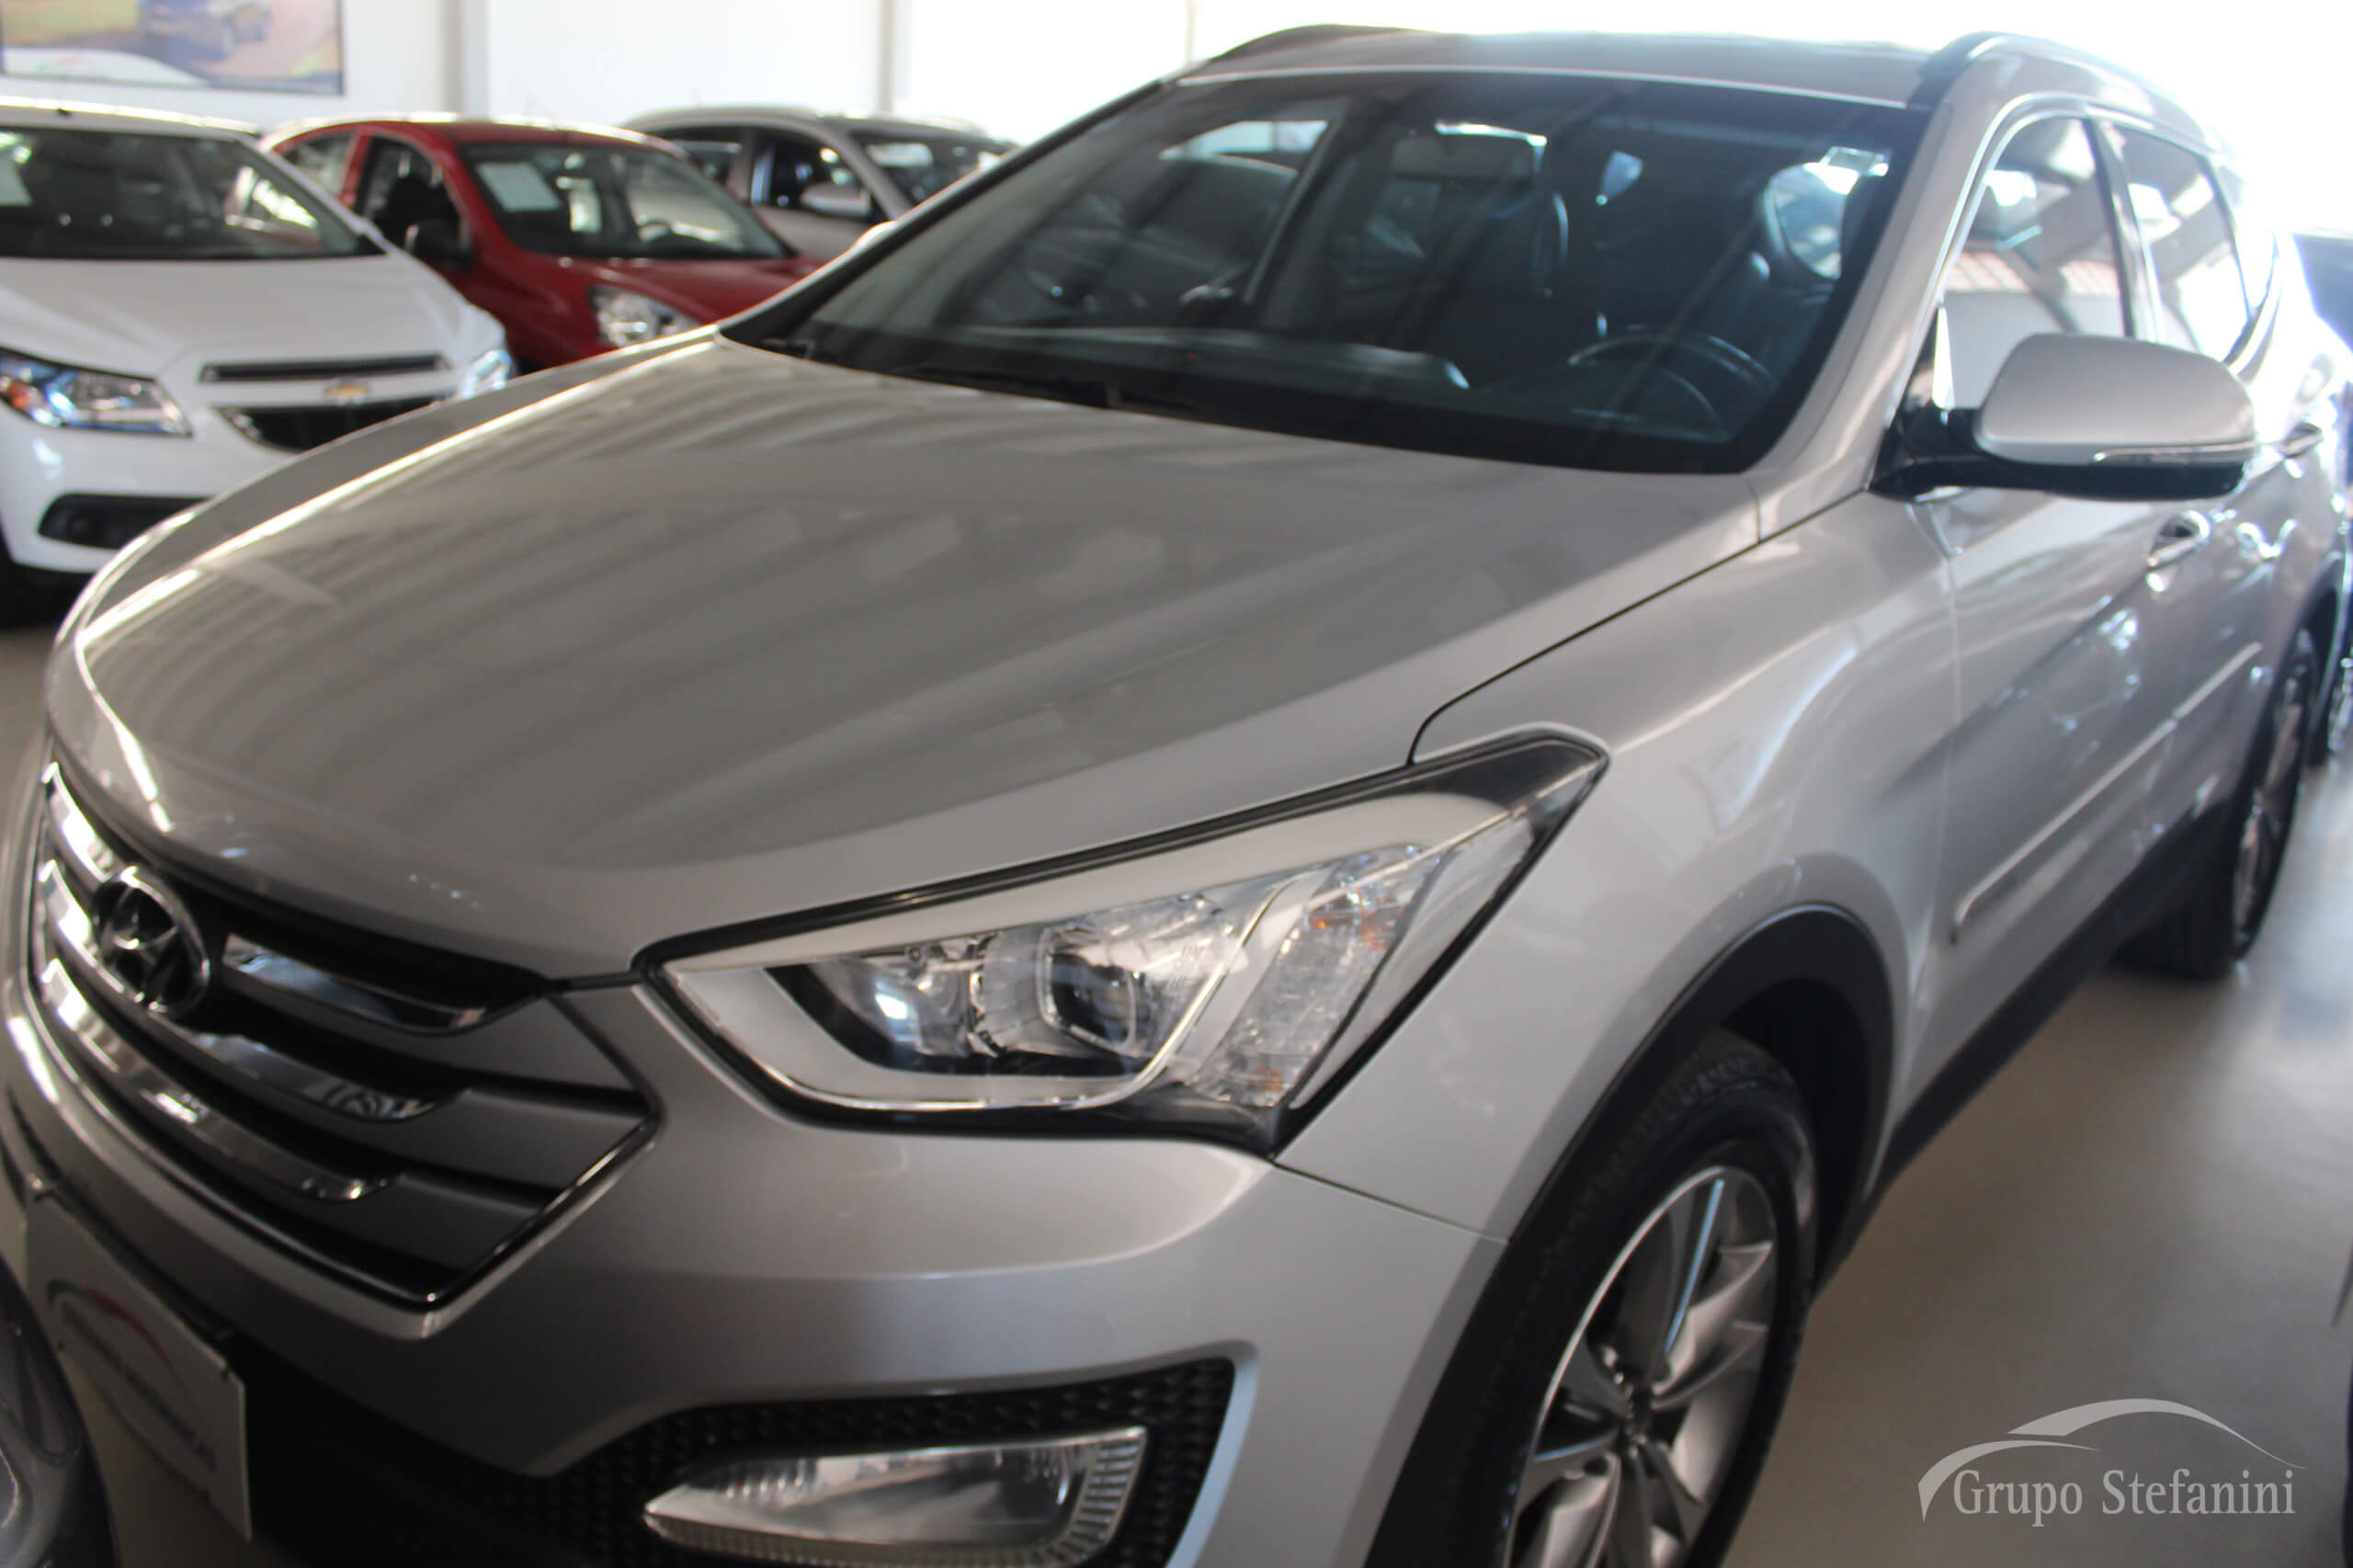 HYUNDAI SANTA FE 3.3 MPFI 4X4 V6 270CV GASOLINA 4P AUTOMÁTICO